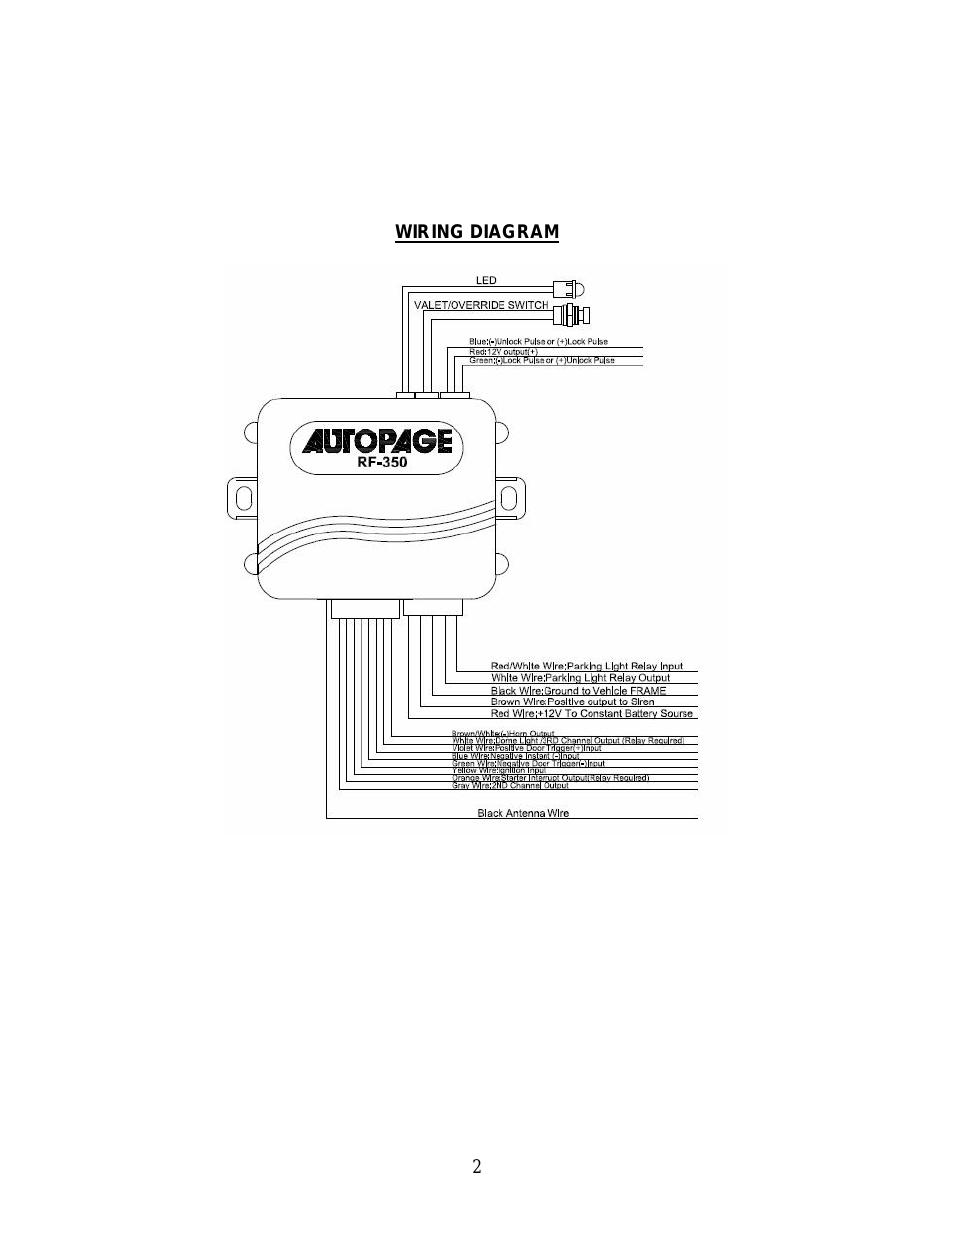 Ready Remote Wiring Diagram Panther Pa720c Remote Start Wiring Diagrams 1 Wiring Diagram Source